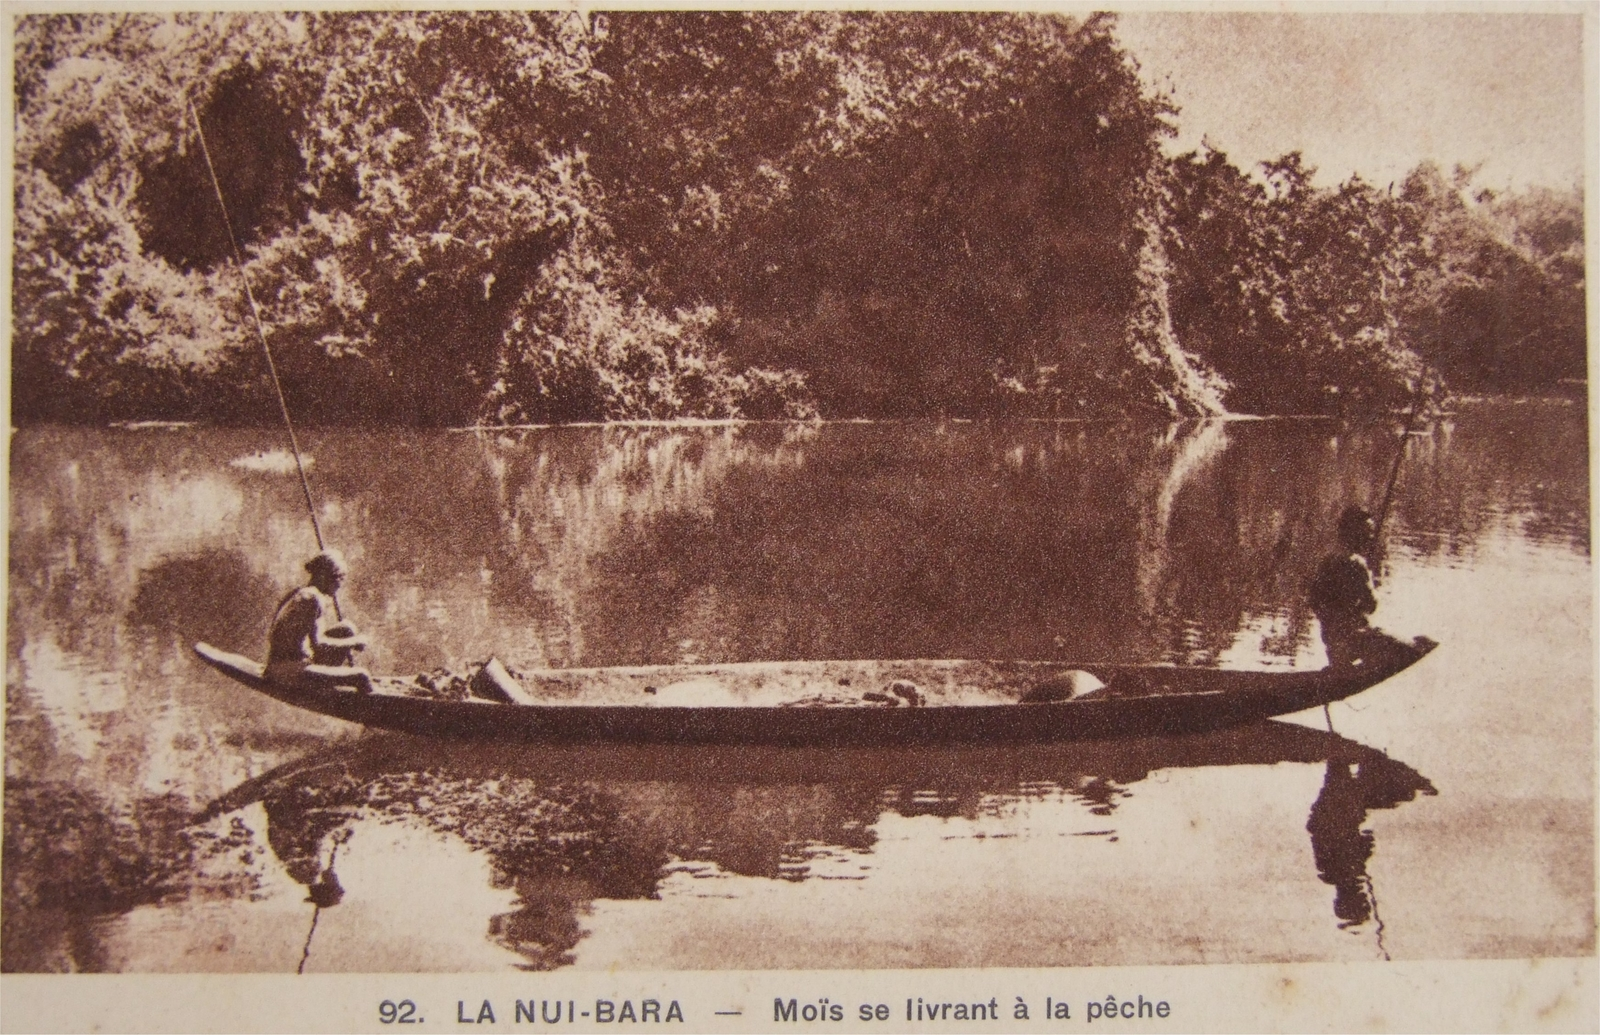 -  Indochine - La Nui-bara - Moïs se livrant à la pêche (1937)